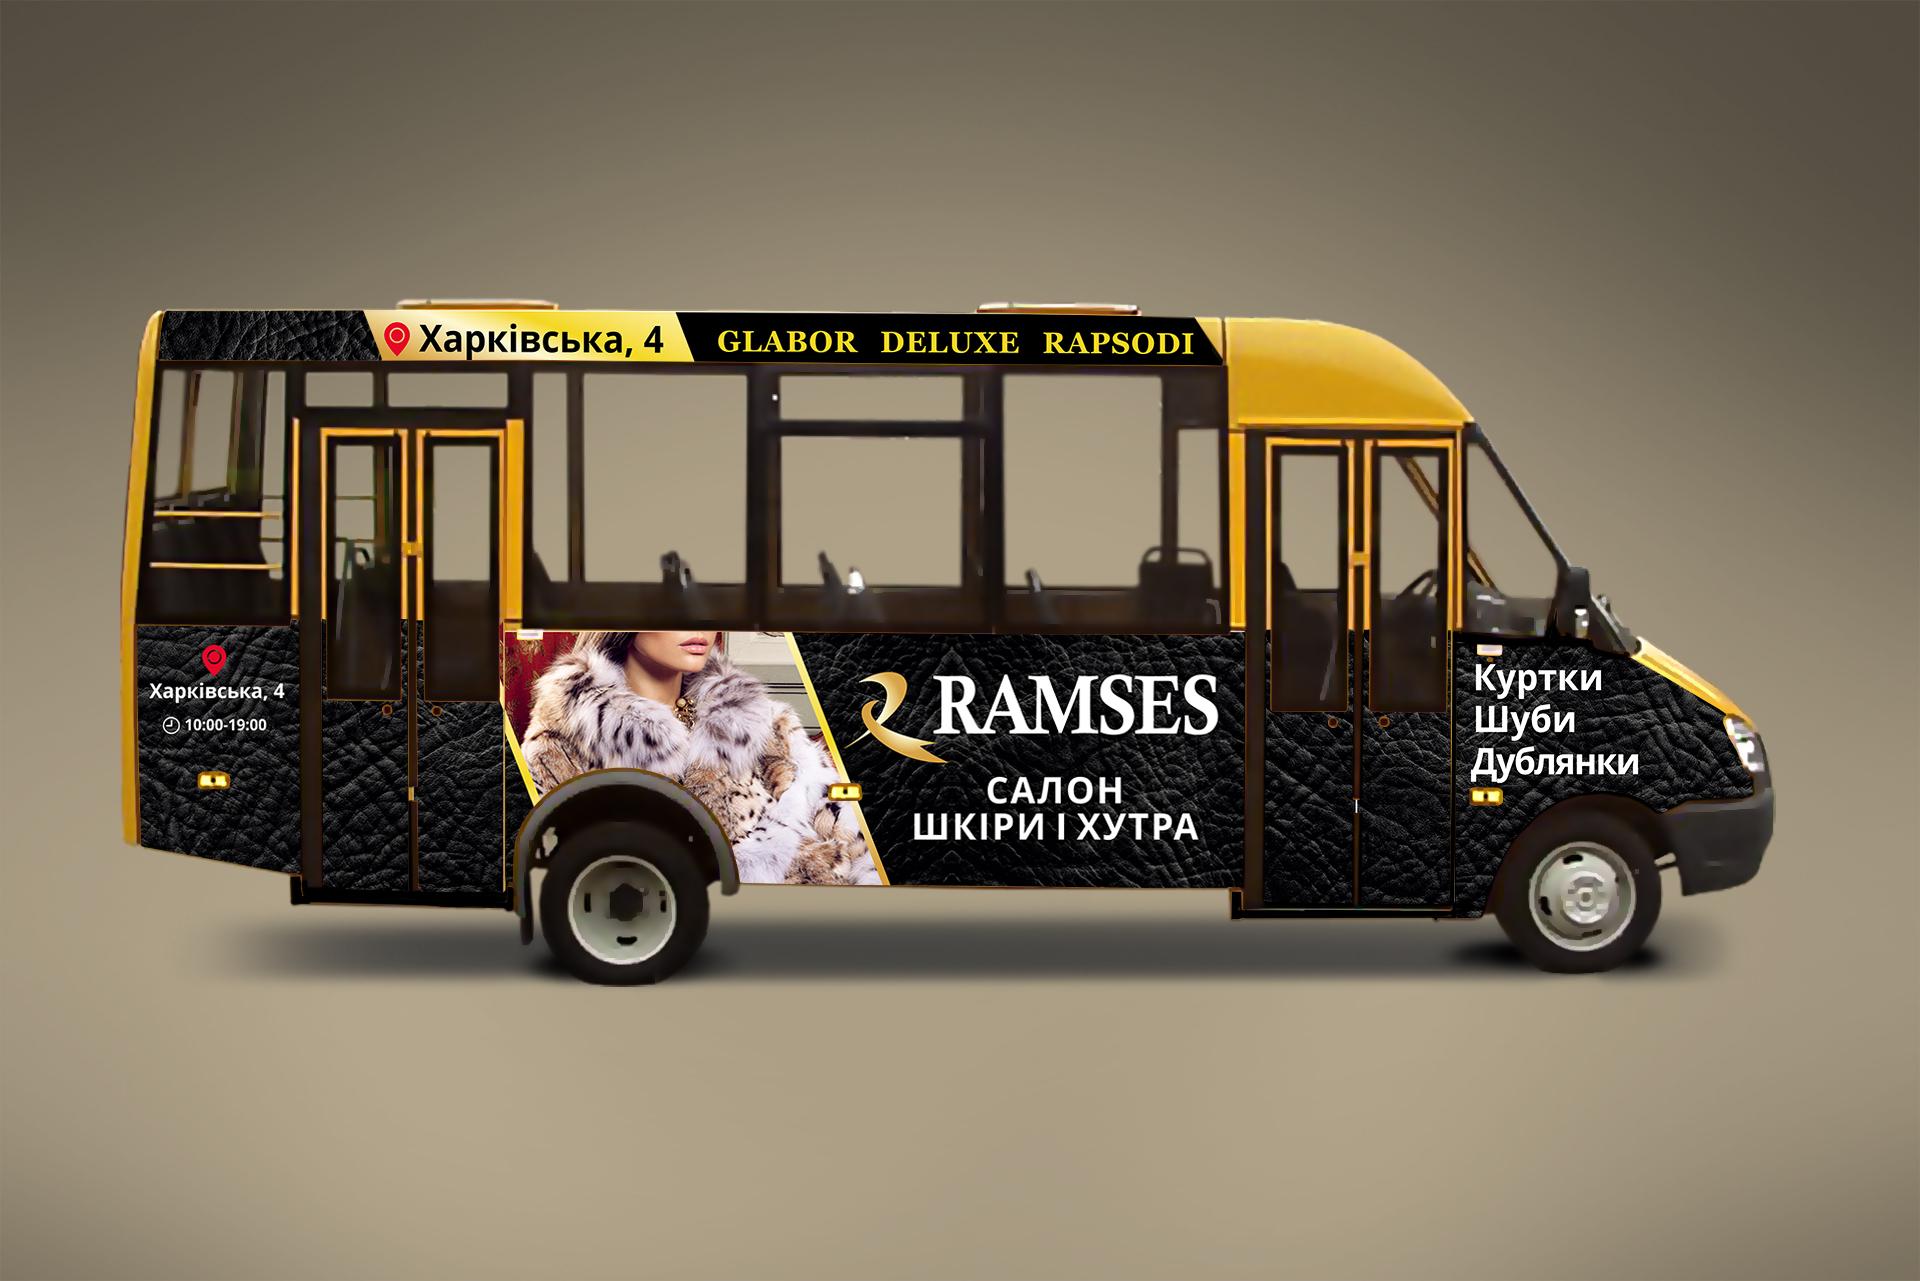 Брендирование транспорта, брендування авто, реклама на транспорте, реклама в транспорті